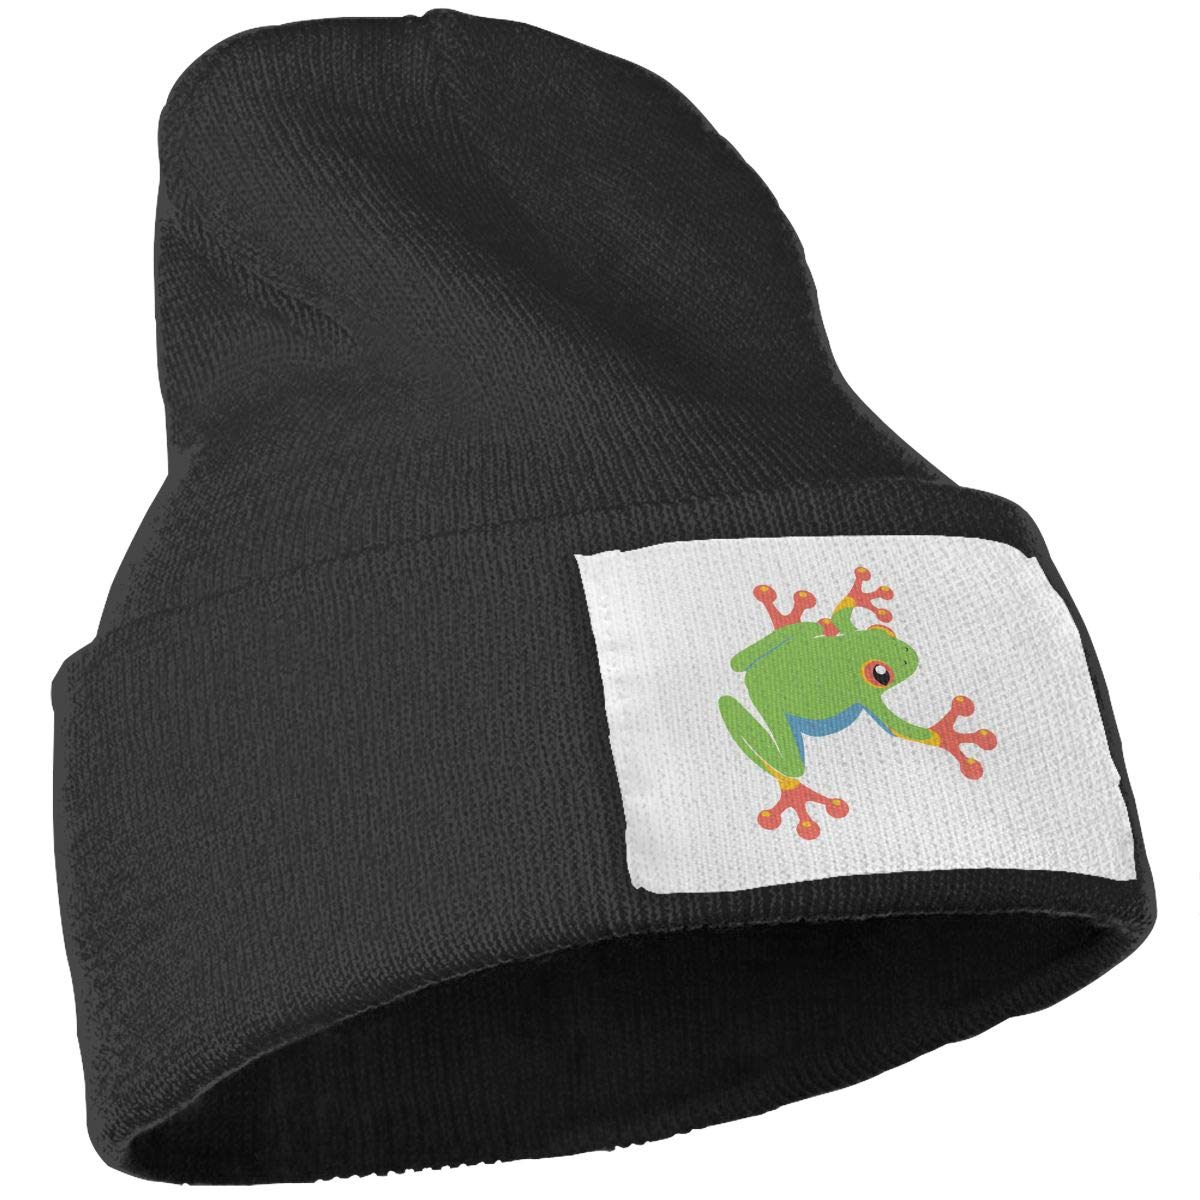 JZMY6 Tree Frog Winter Warm Beanie Hat Knit Cap